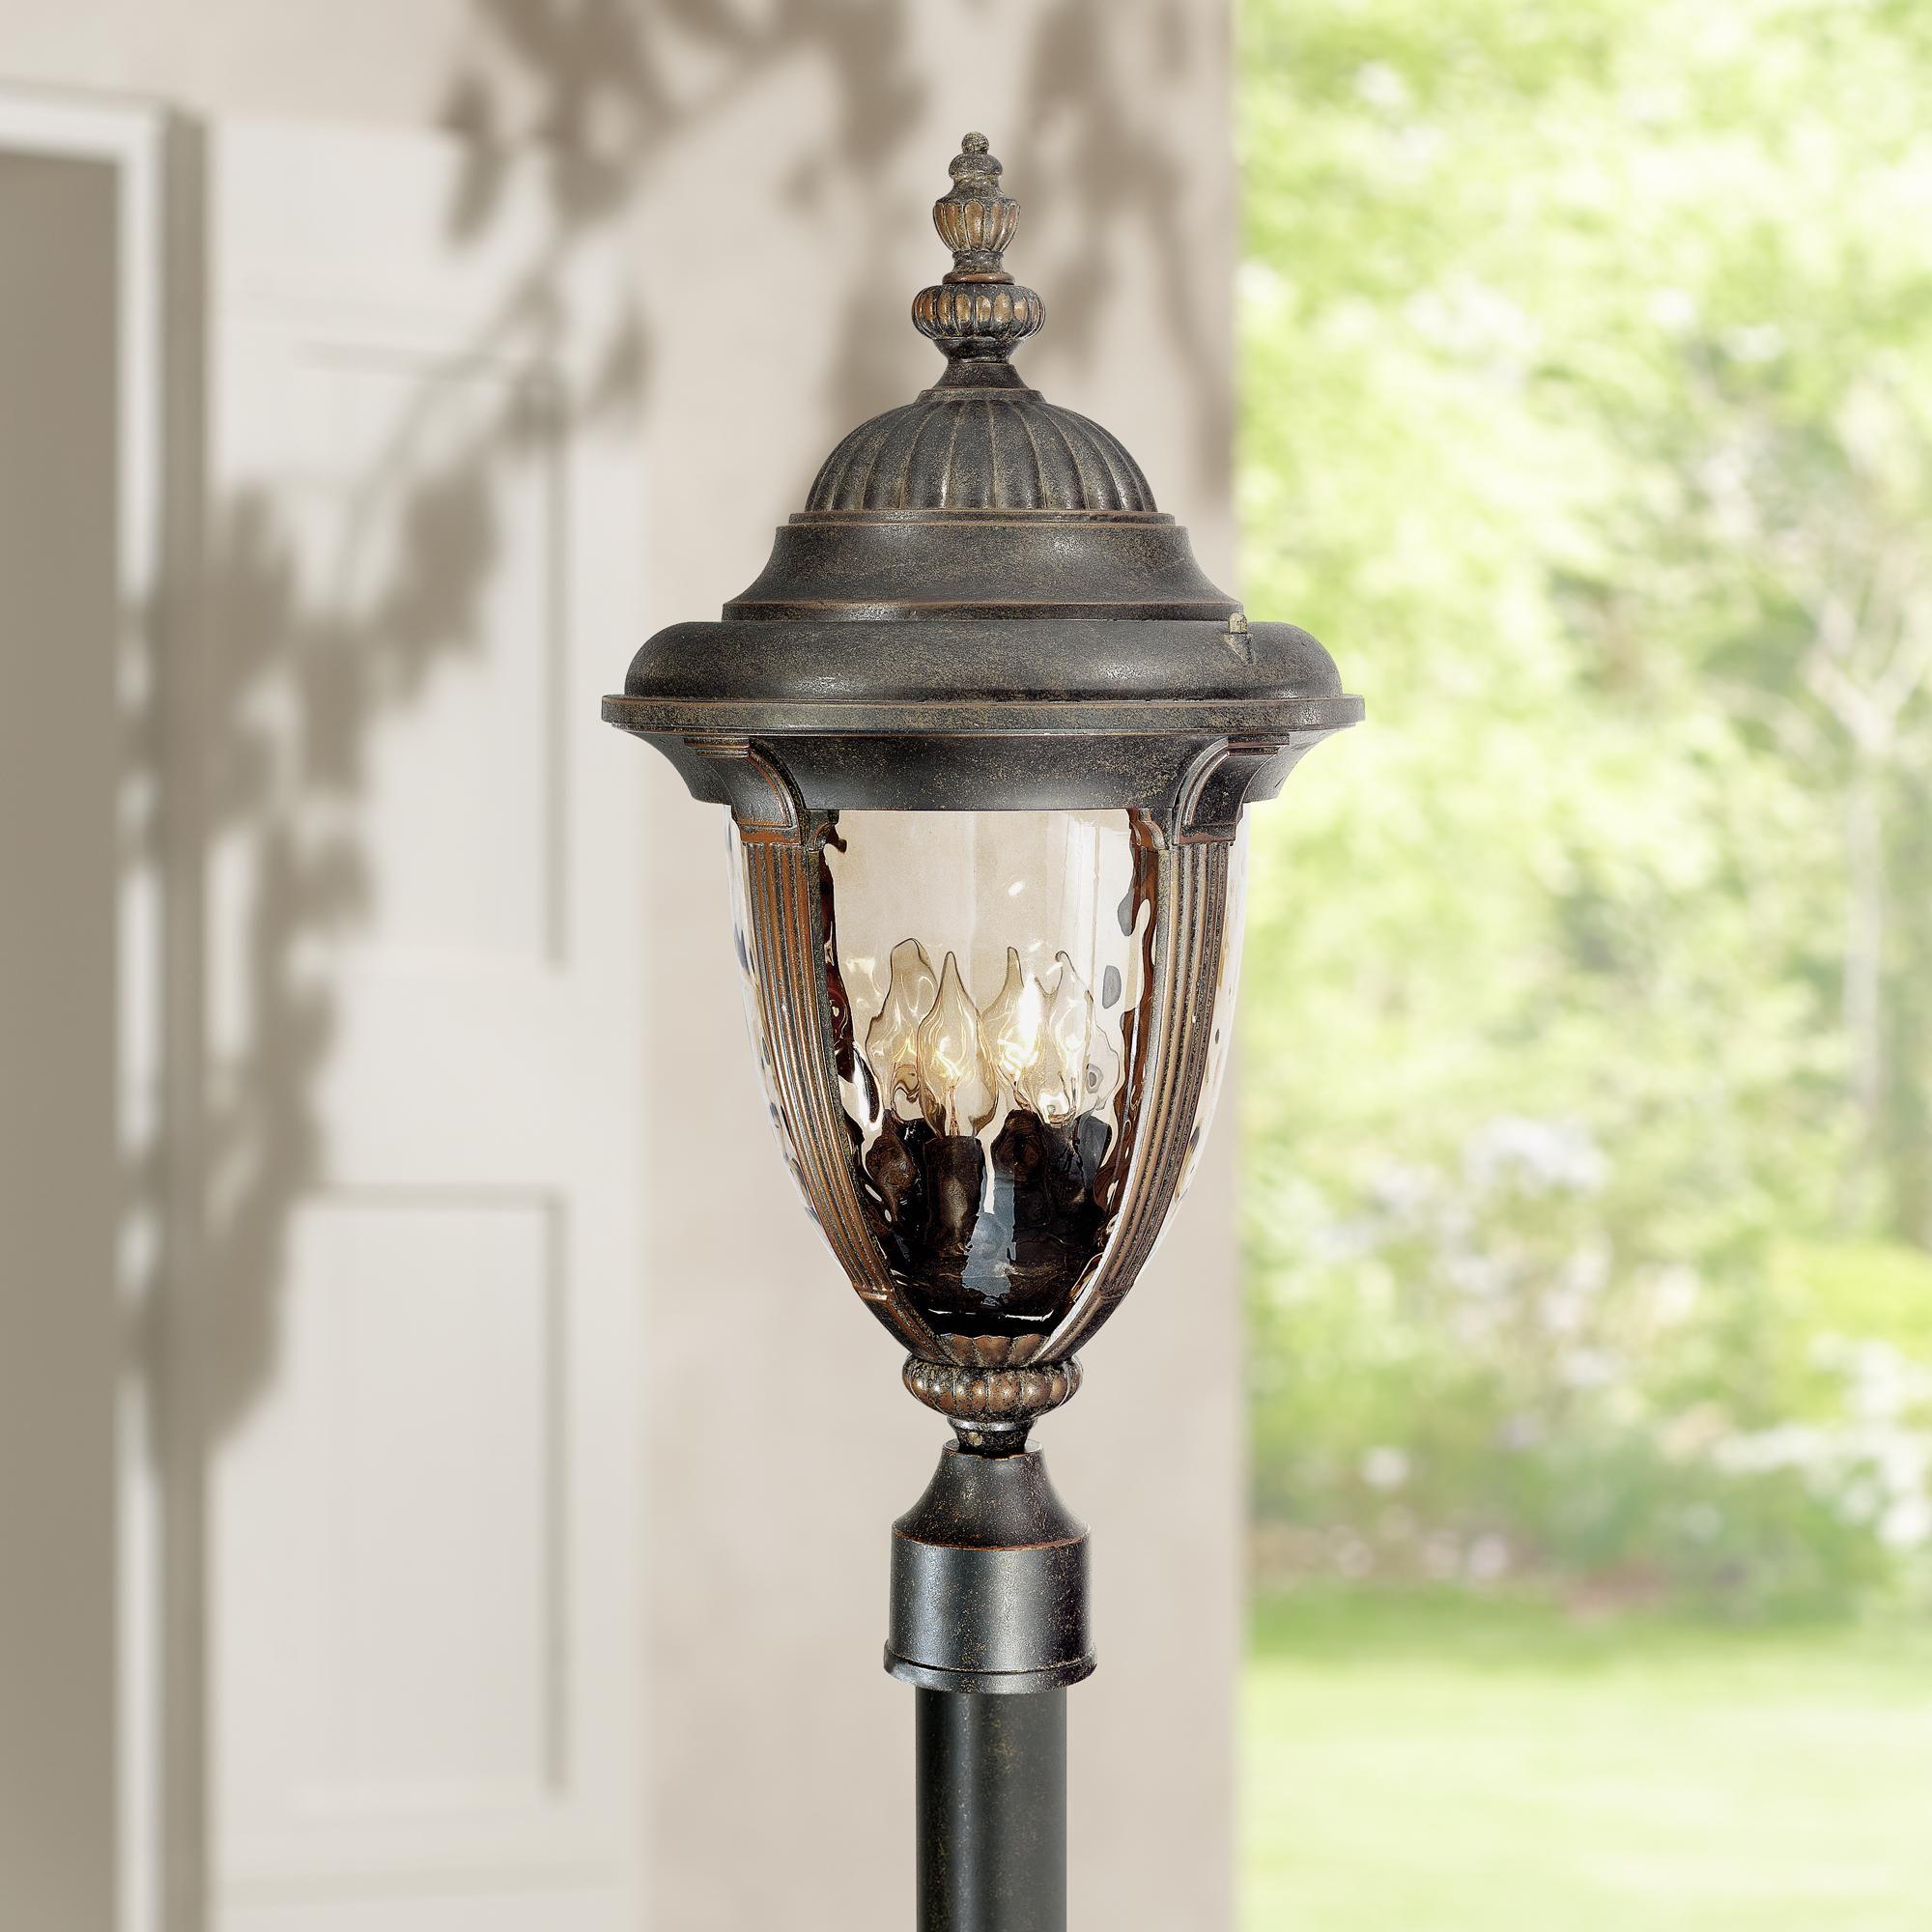 Bellagio 24 And One Half Inch High Bronze 4 Light Outdoor Post Light